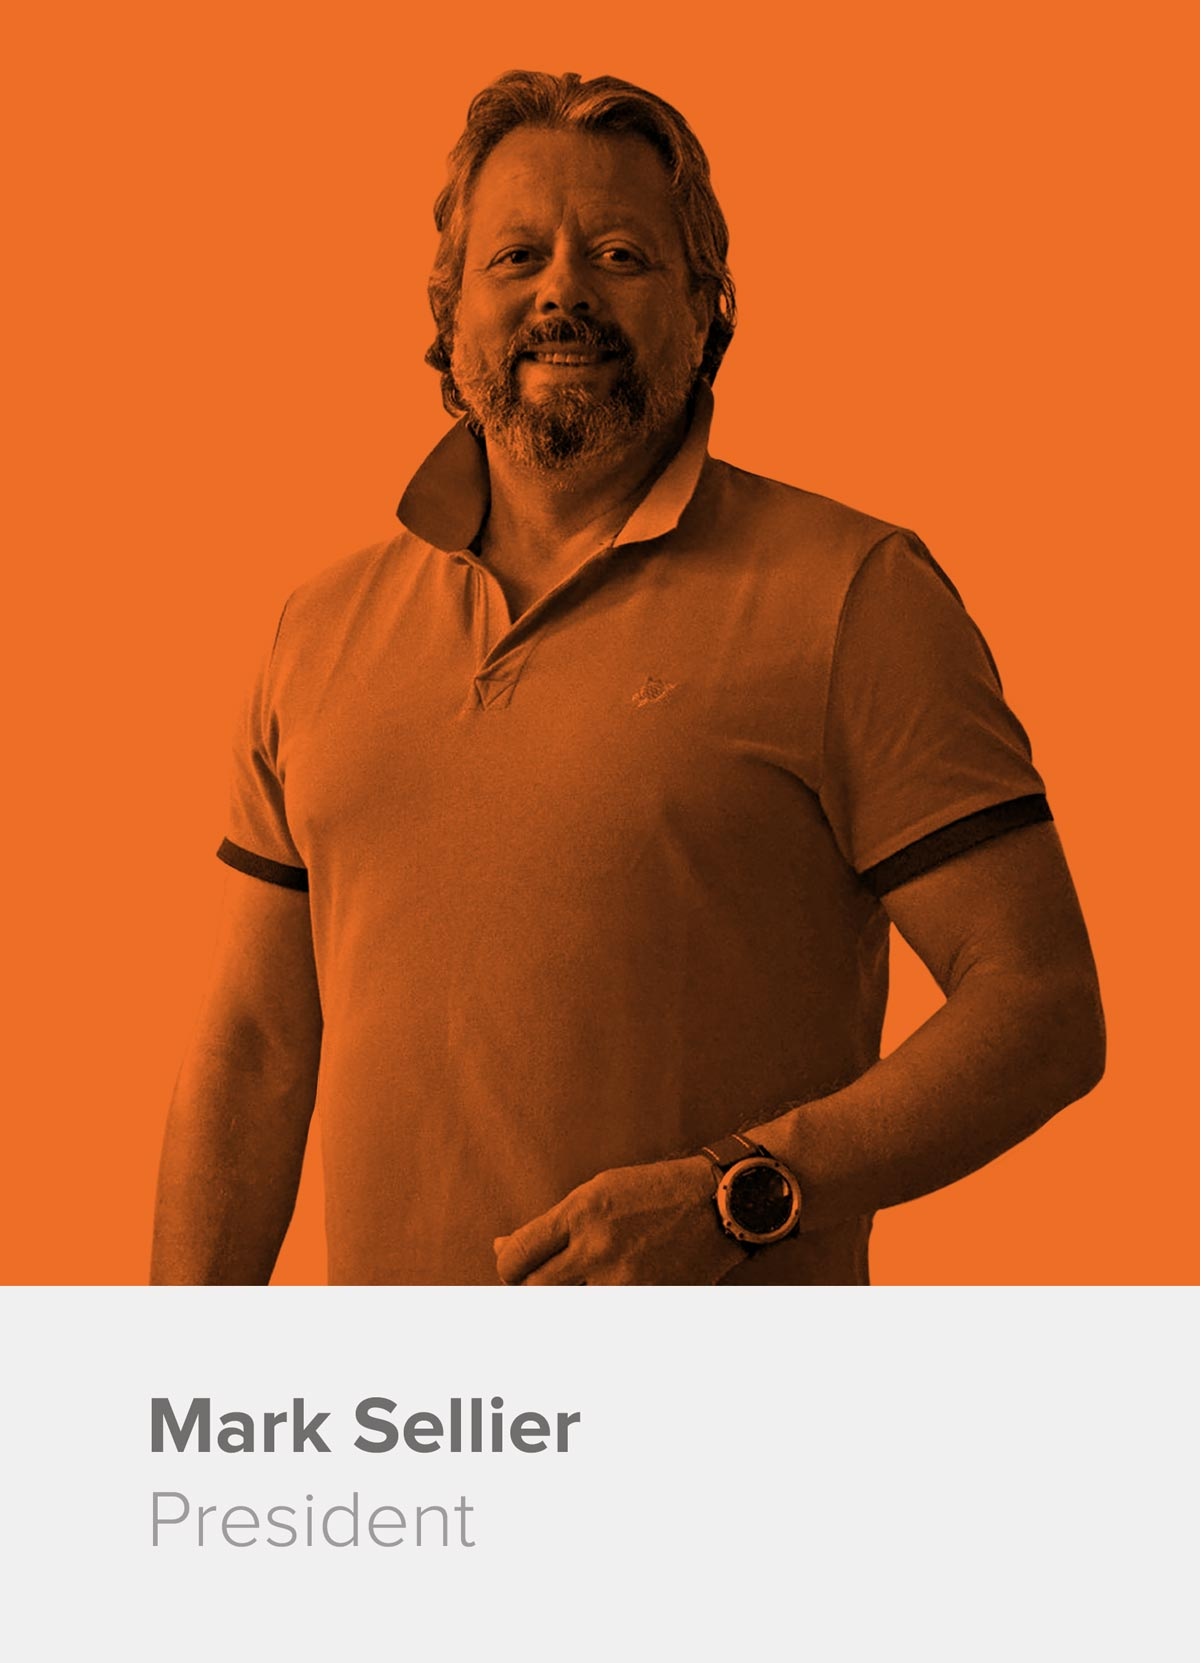 Mark Sellier